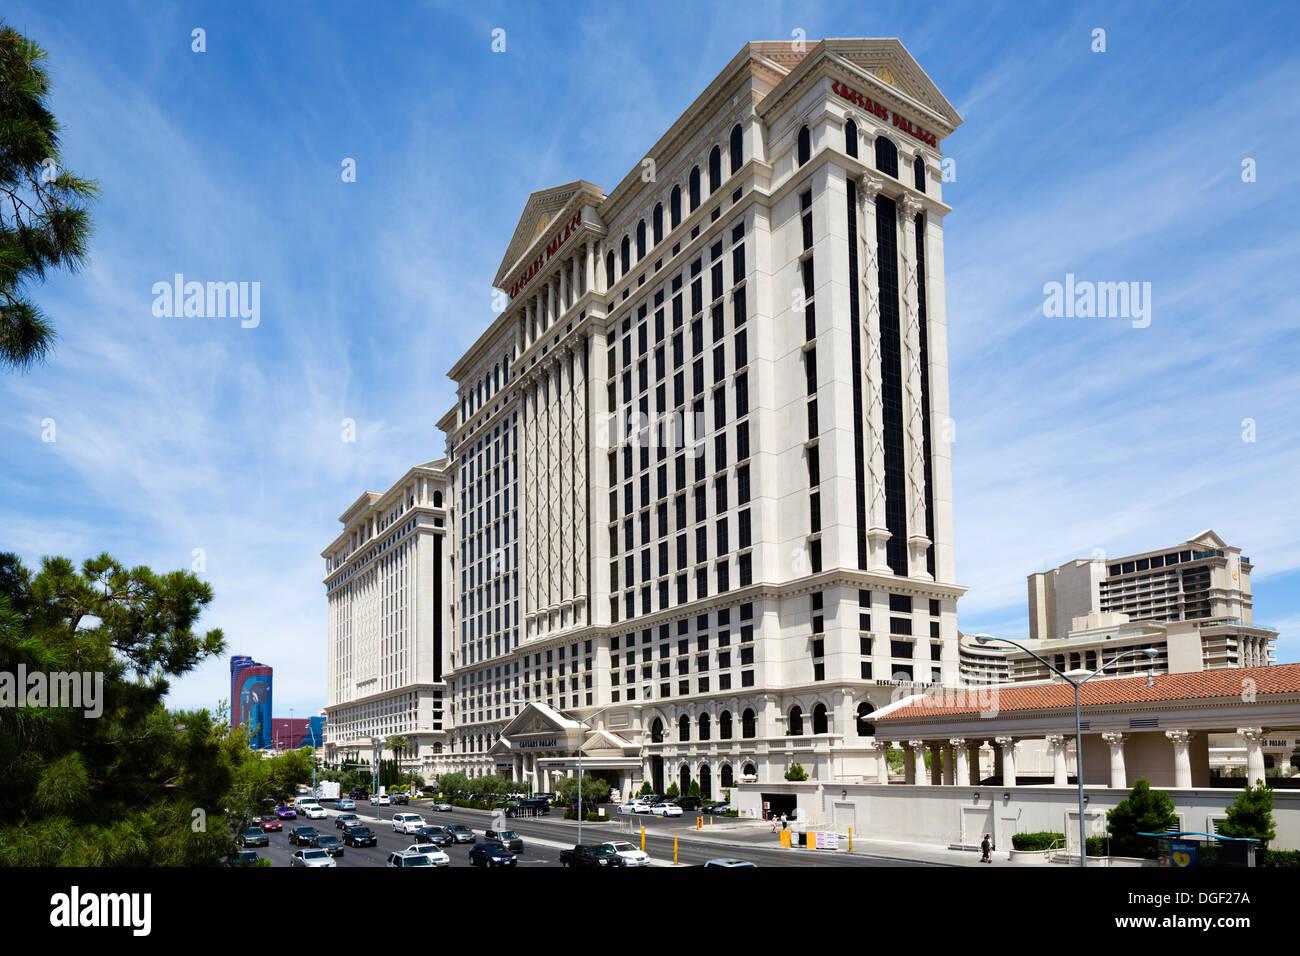 Caesars Palace hotel and casino, viewed from Flamingo Road, Las Vegas, Nevada, USA - Stock Image